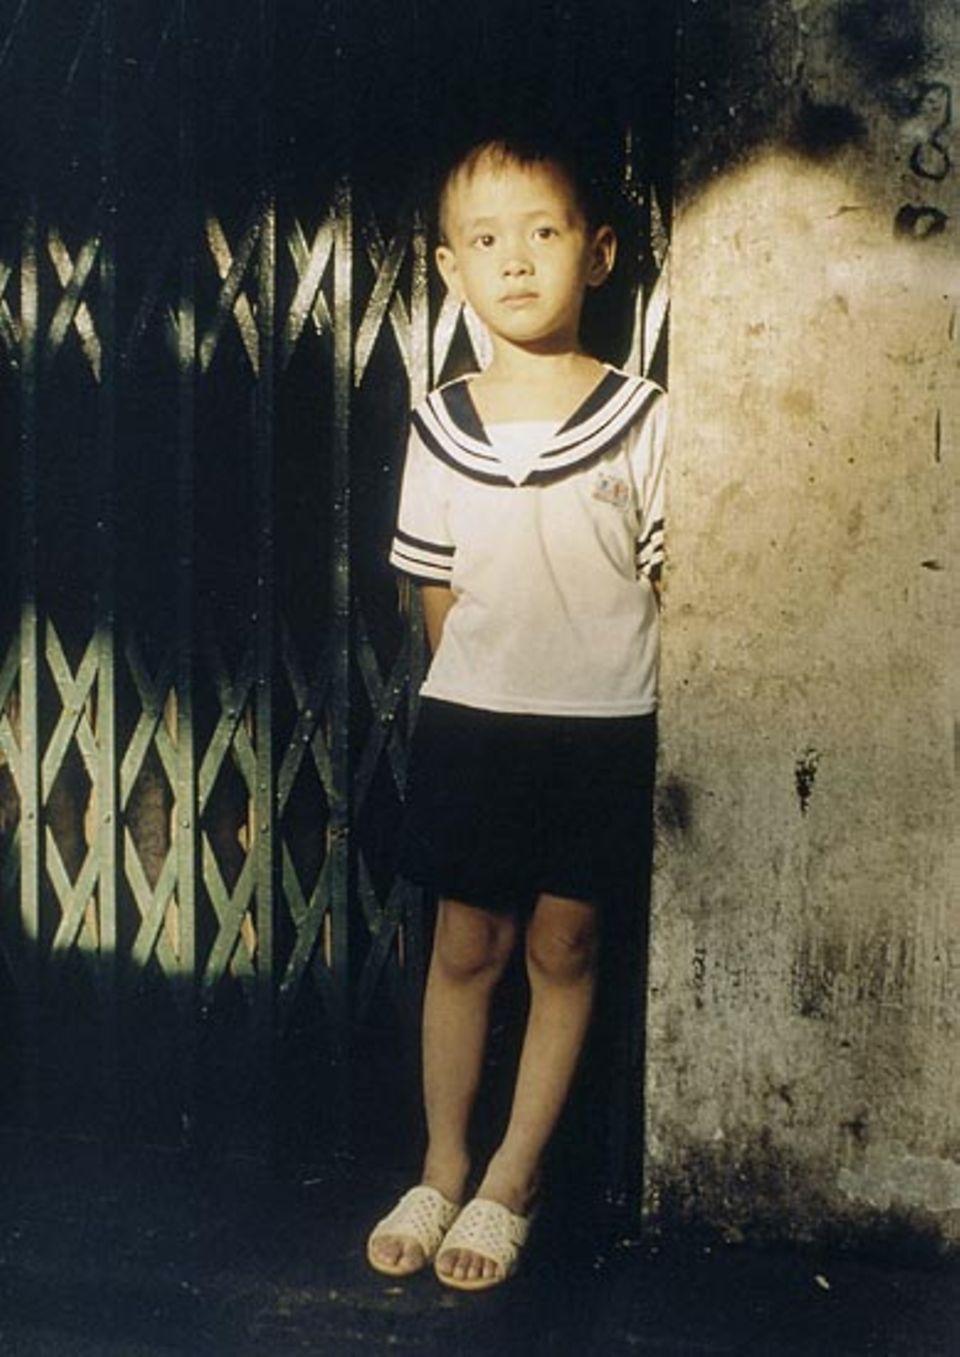 Ha Le Nguyen, geboren am 15. November 1998 in Hanoi, Vietnam